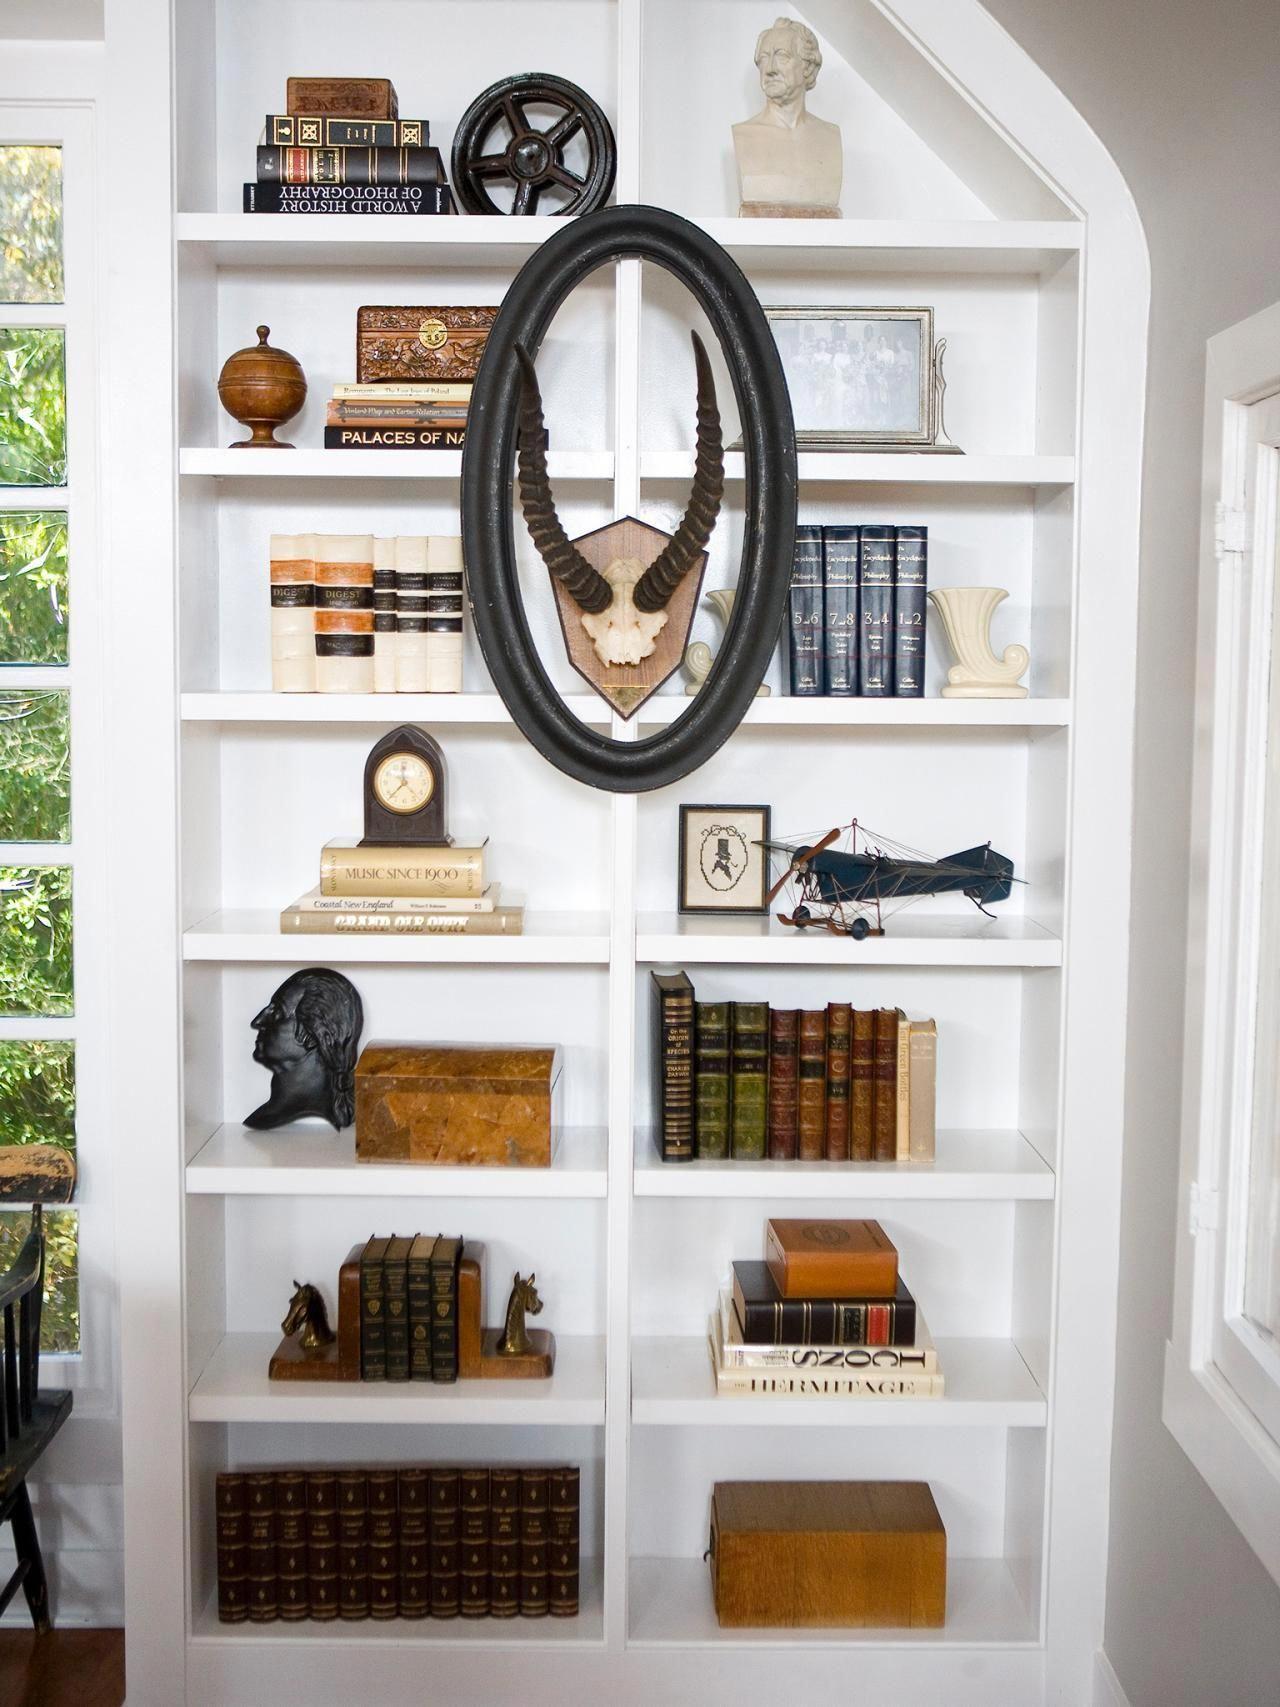 ways to bring americana style home interior design styles and color schemes for decorating hgtv interiordesignstylesandideas also rh pinterest